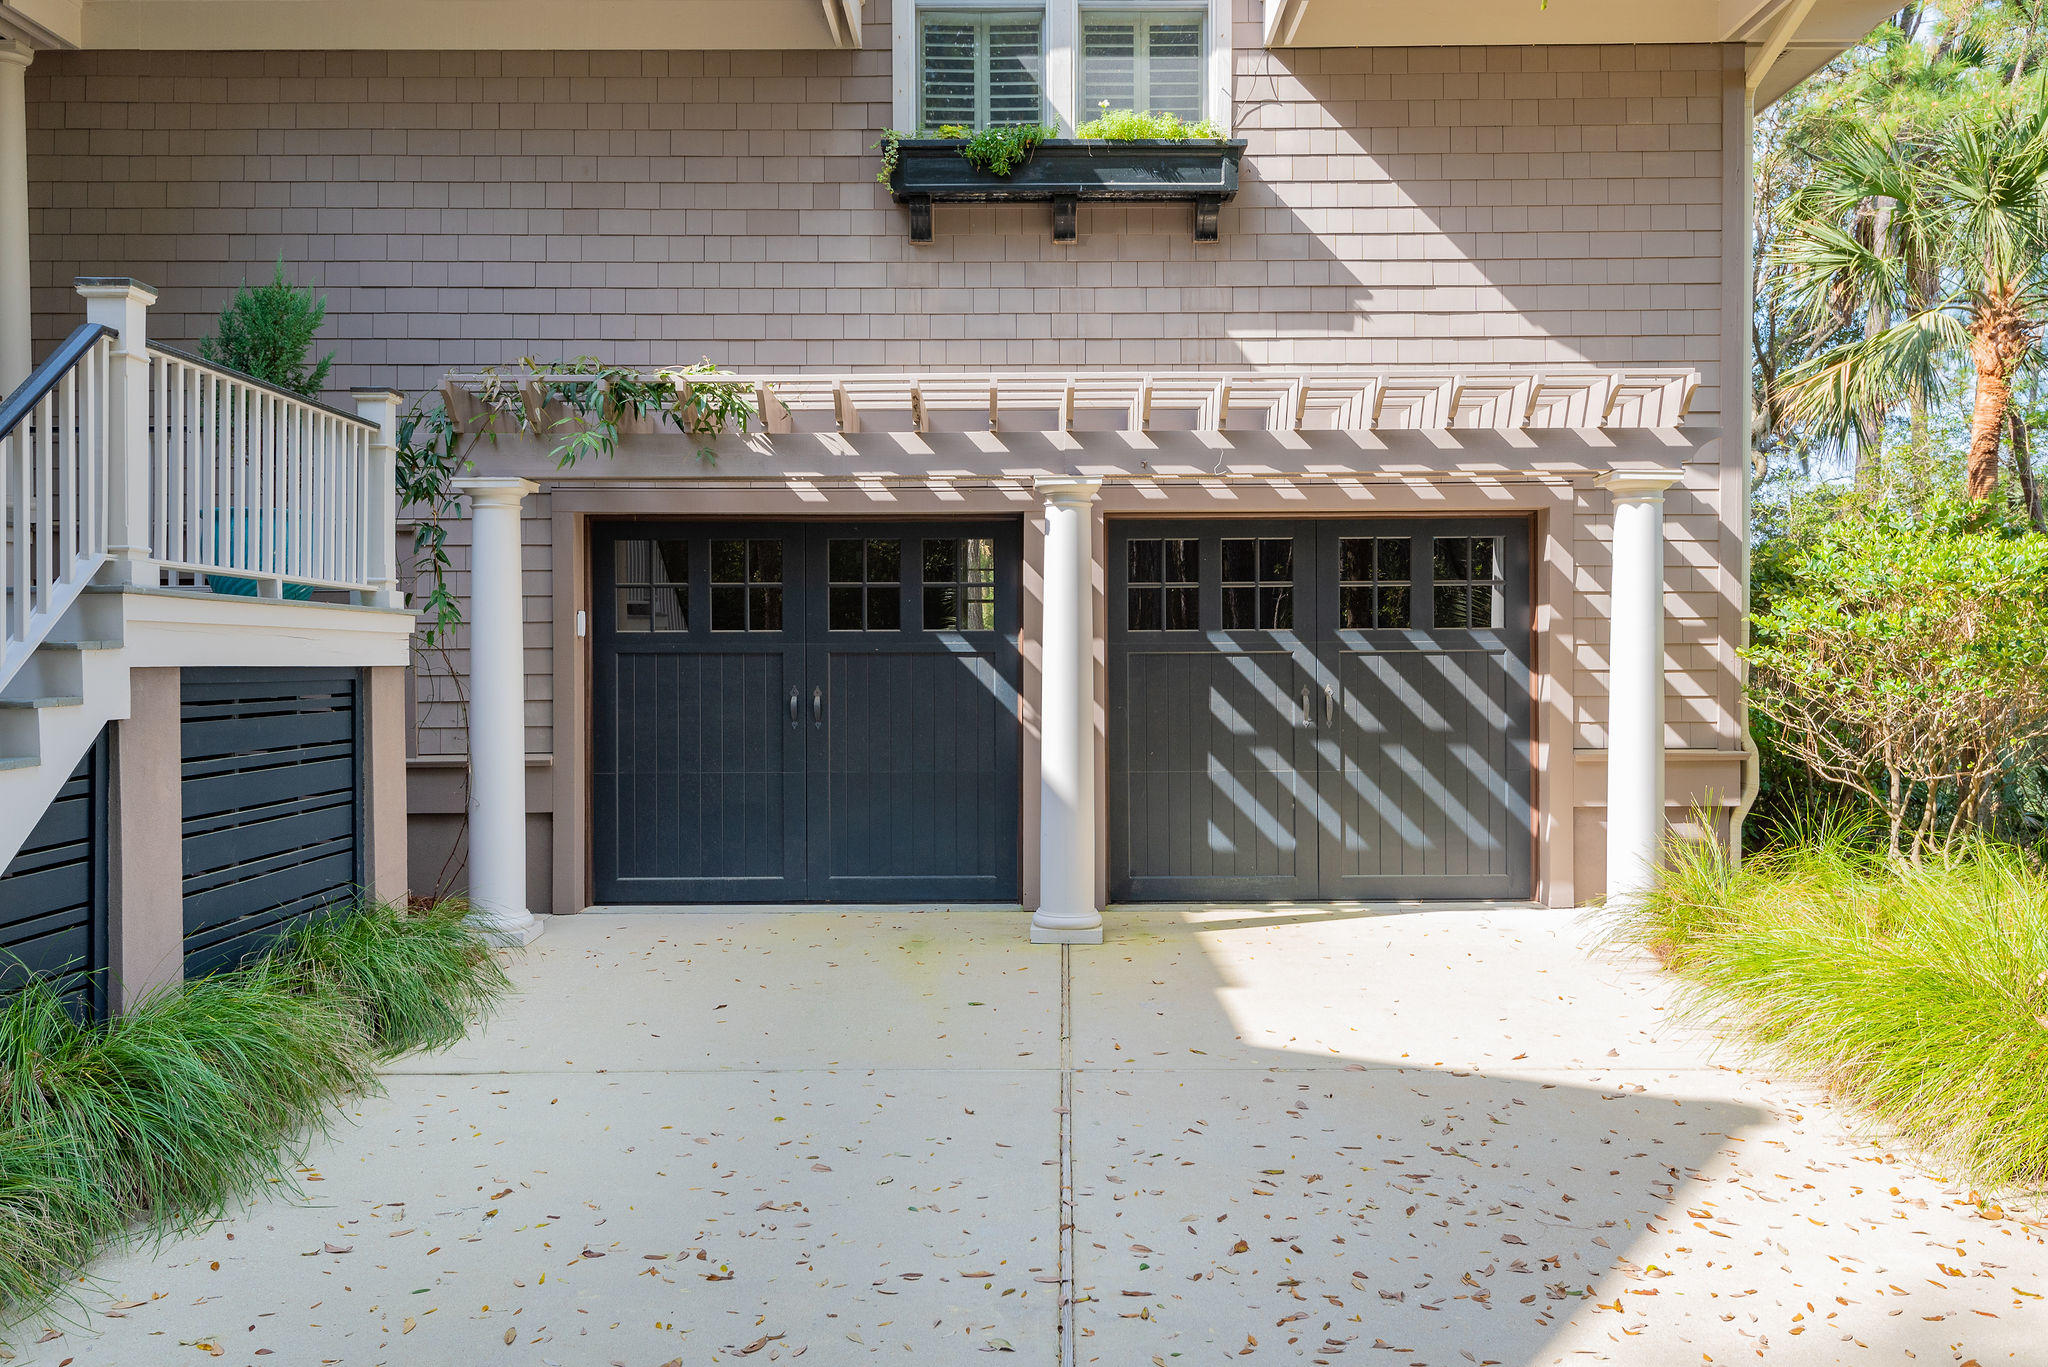 Kiawah Island Homes For Sale - 3 Grey Widgeon, Kiawah Island, SC - 65